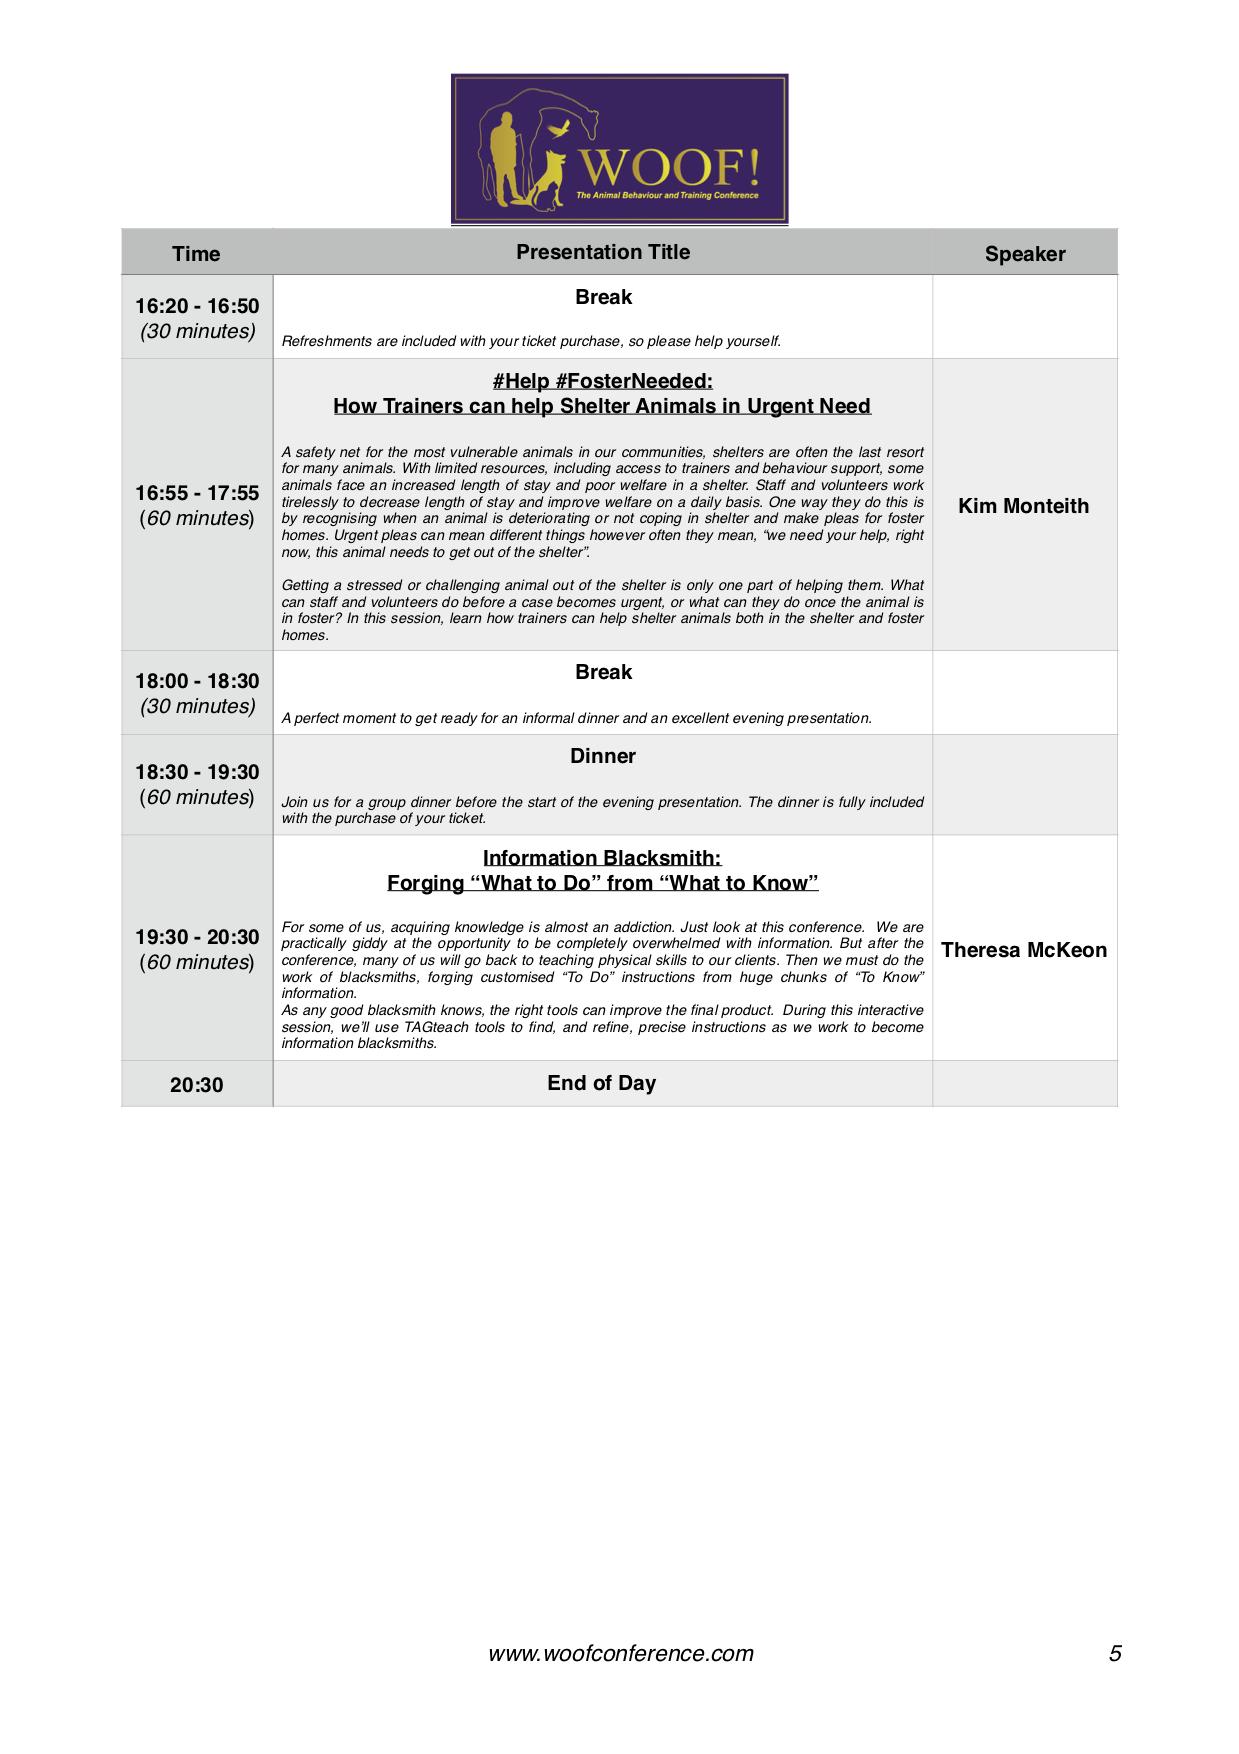 WOOF! 2019 Schedule Public 1.0 Page 5.jpg